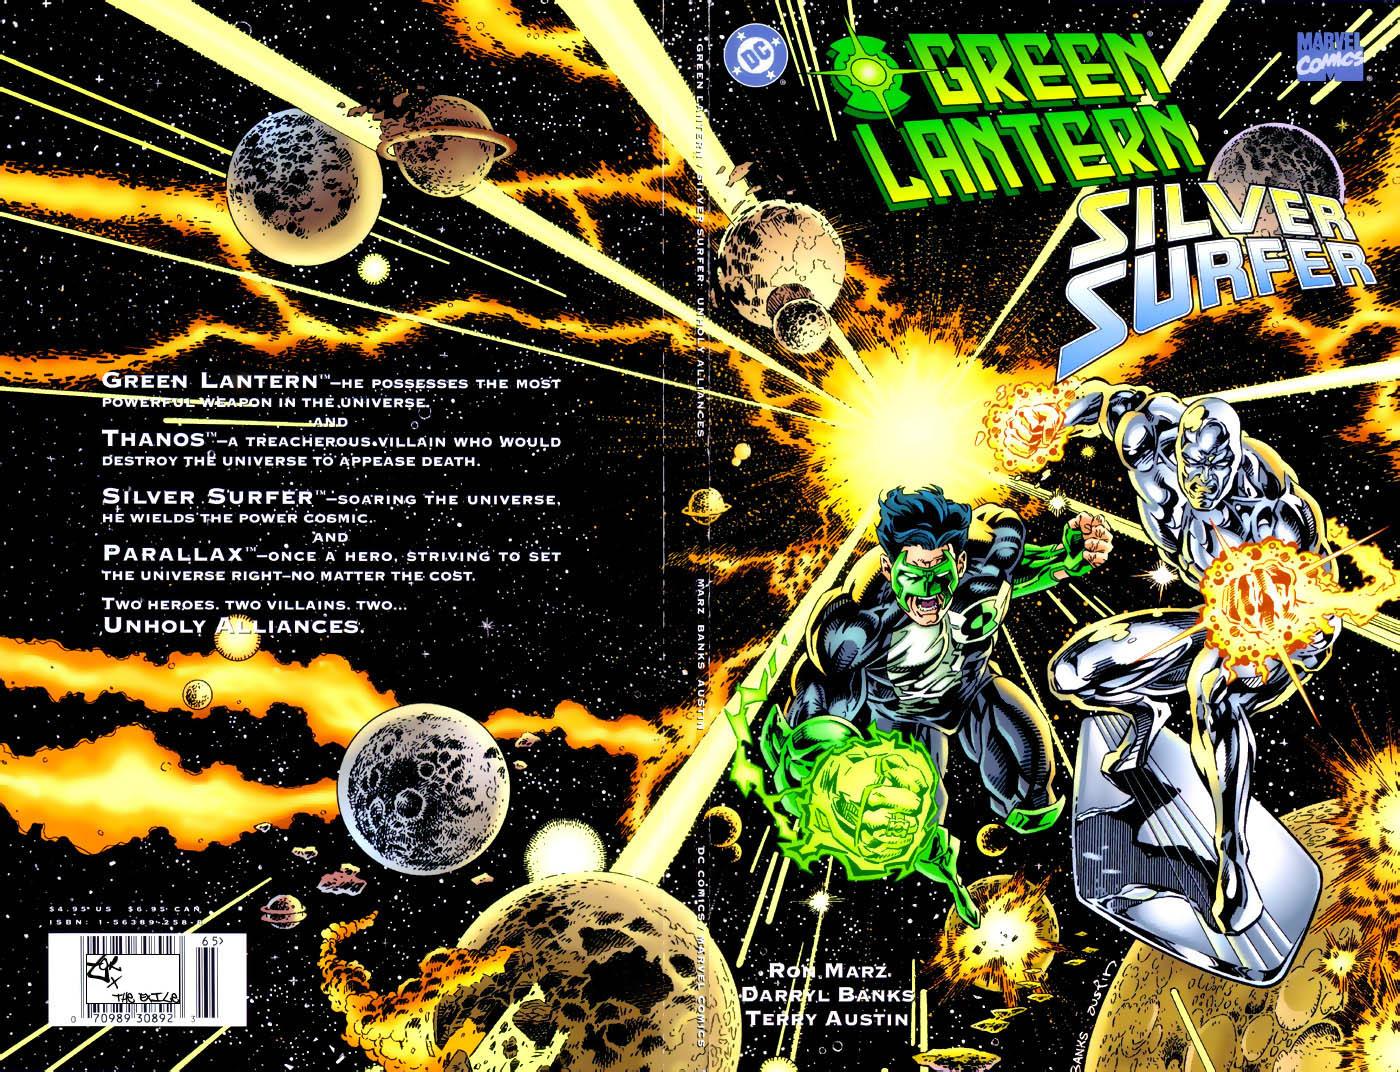 Green Lantern/Silver Surfer: Unholy Alliances Full Page 1